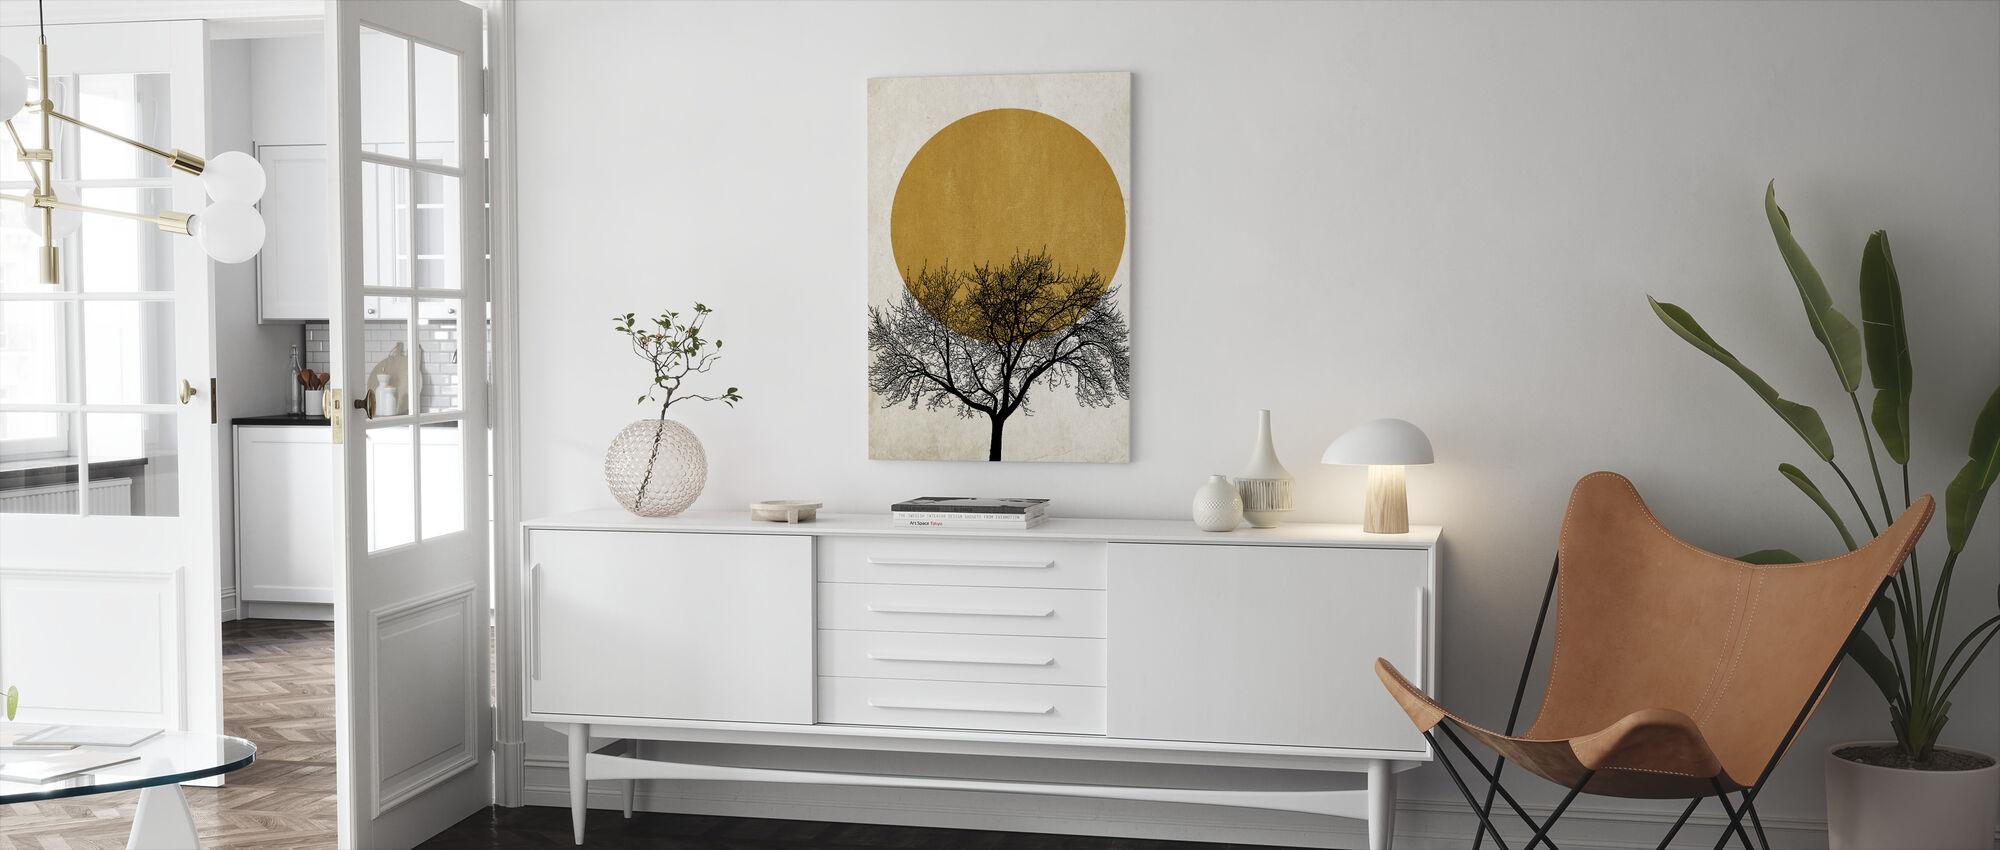 Winter Morning - Canvas print - Living Room